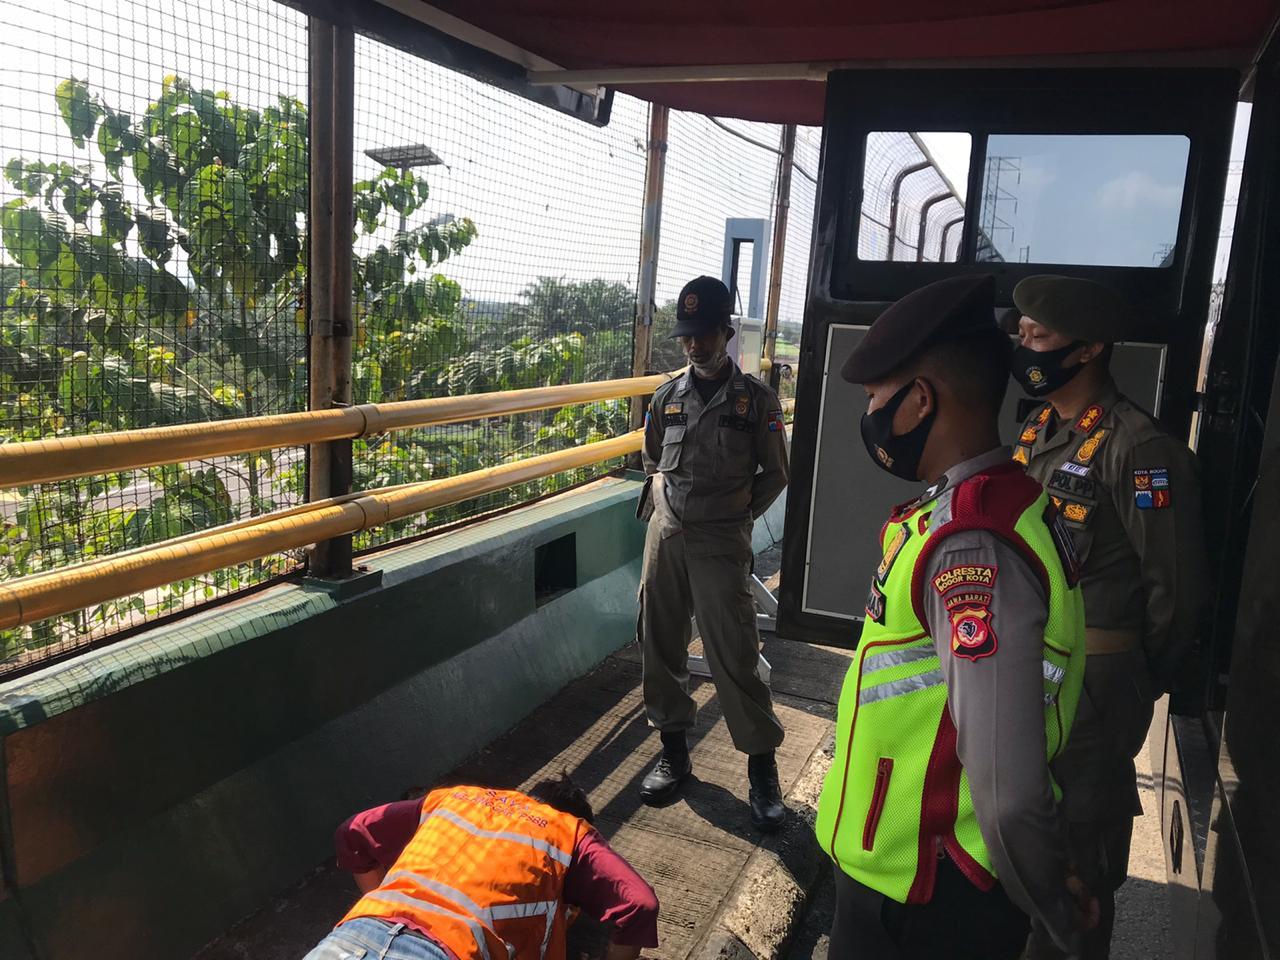 Operasi Yustisi Gabungan Kota Bogor Tindak Pelanggar Protokol Kesehatan